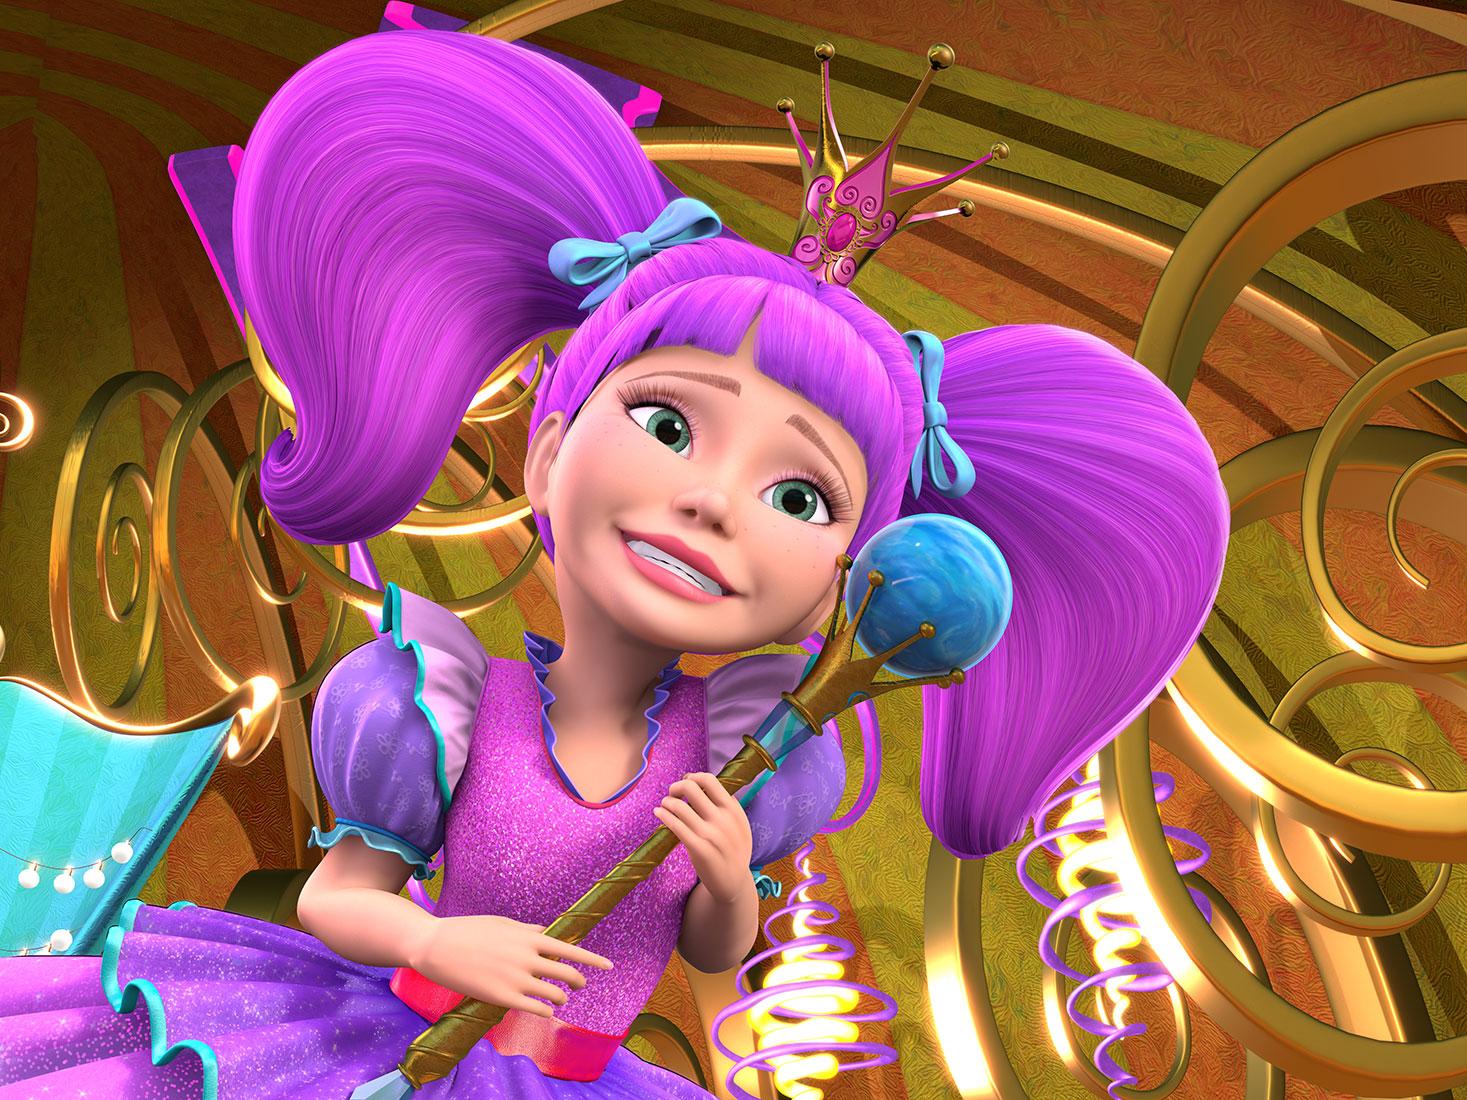 Barbie and The Secret Door Official Stills 5.jpg  sc 1 st  Barbie Movies Wiki - Fandom & Image - Barbie and The Secret Door Official Stills 5.jpg | Barbie ...